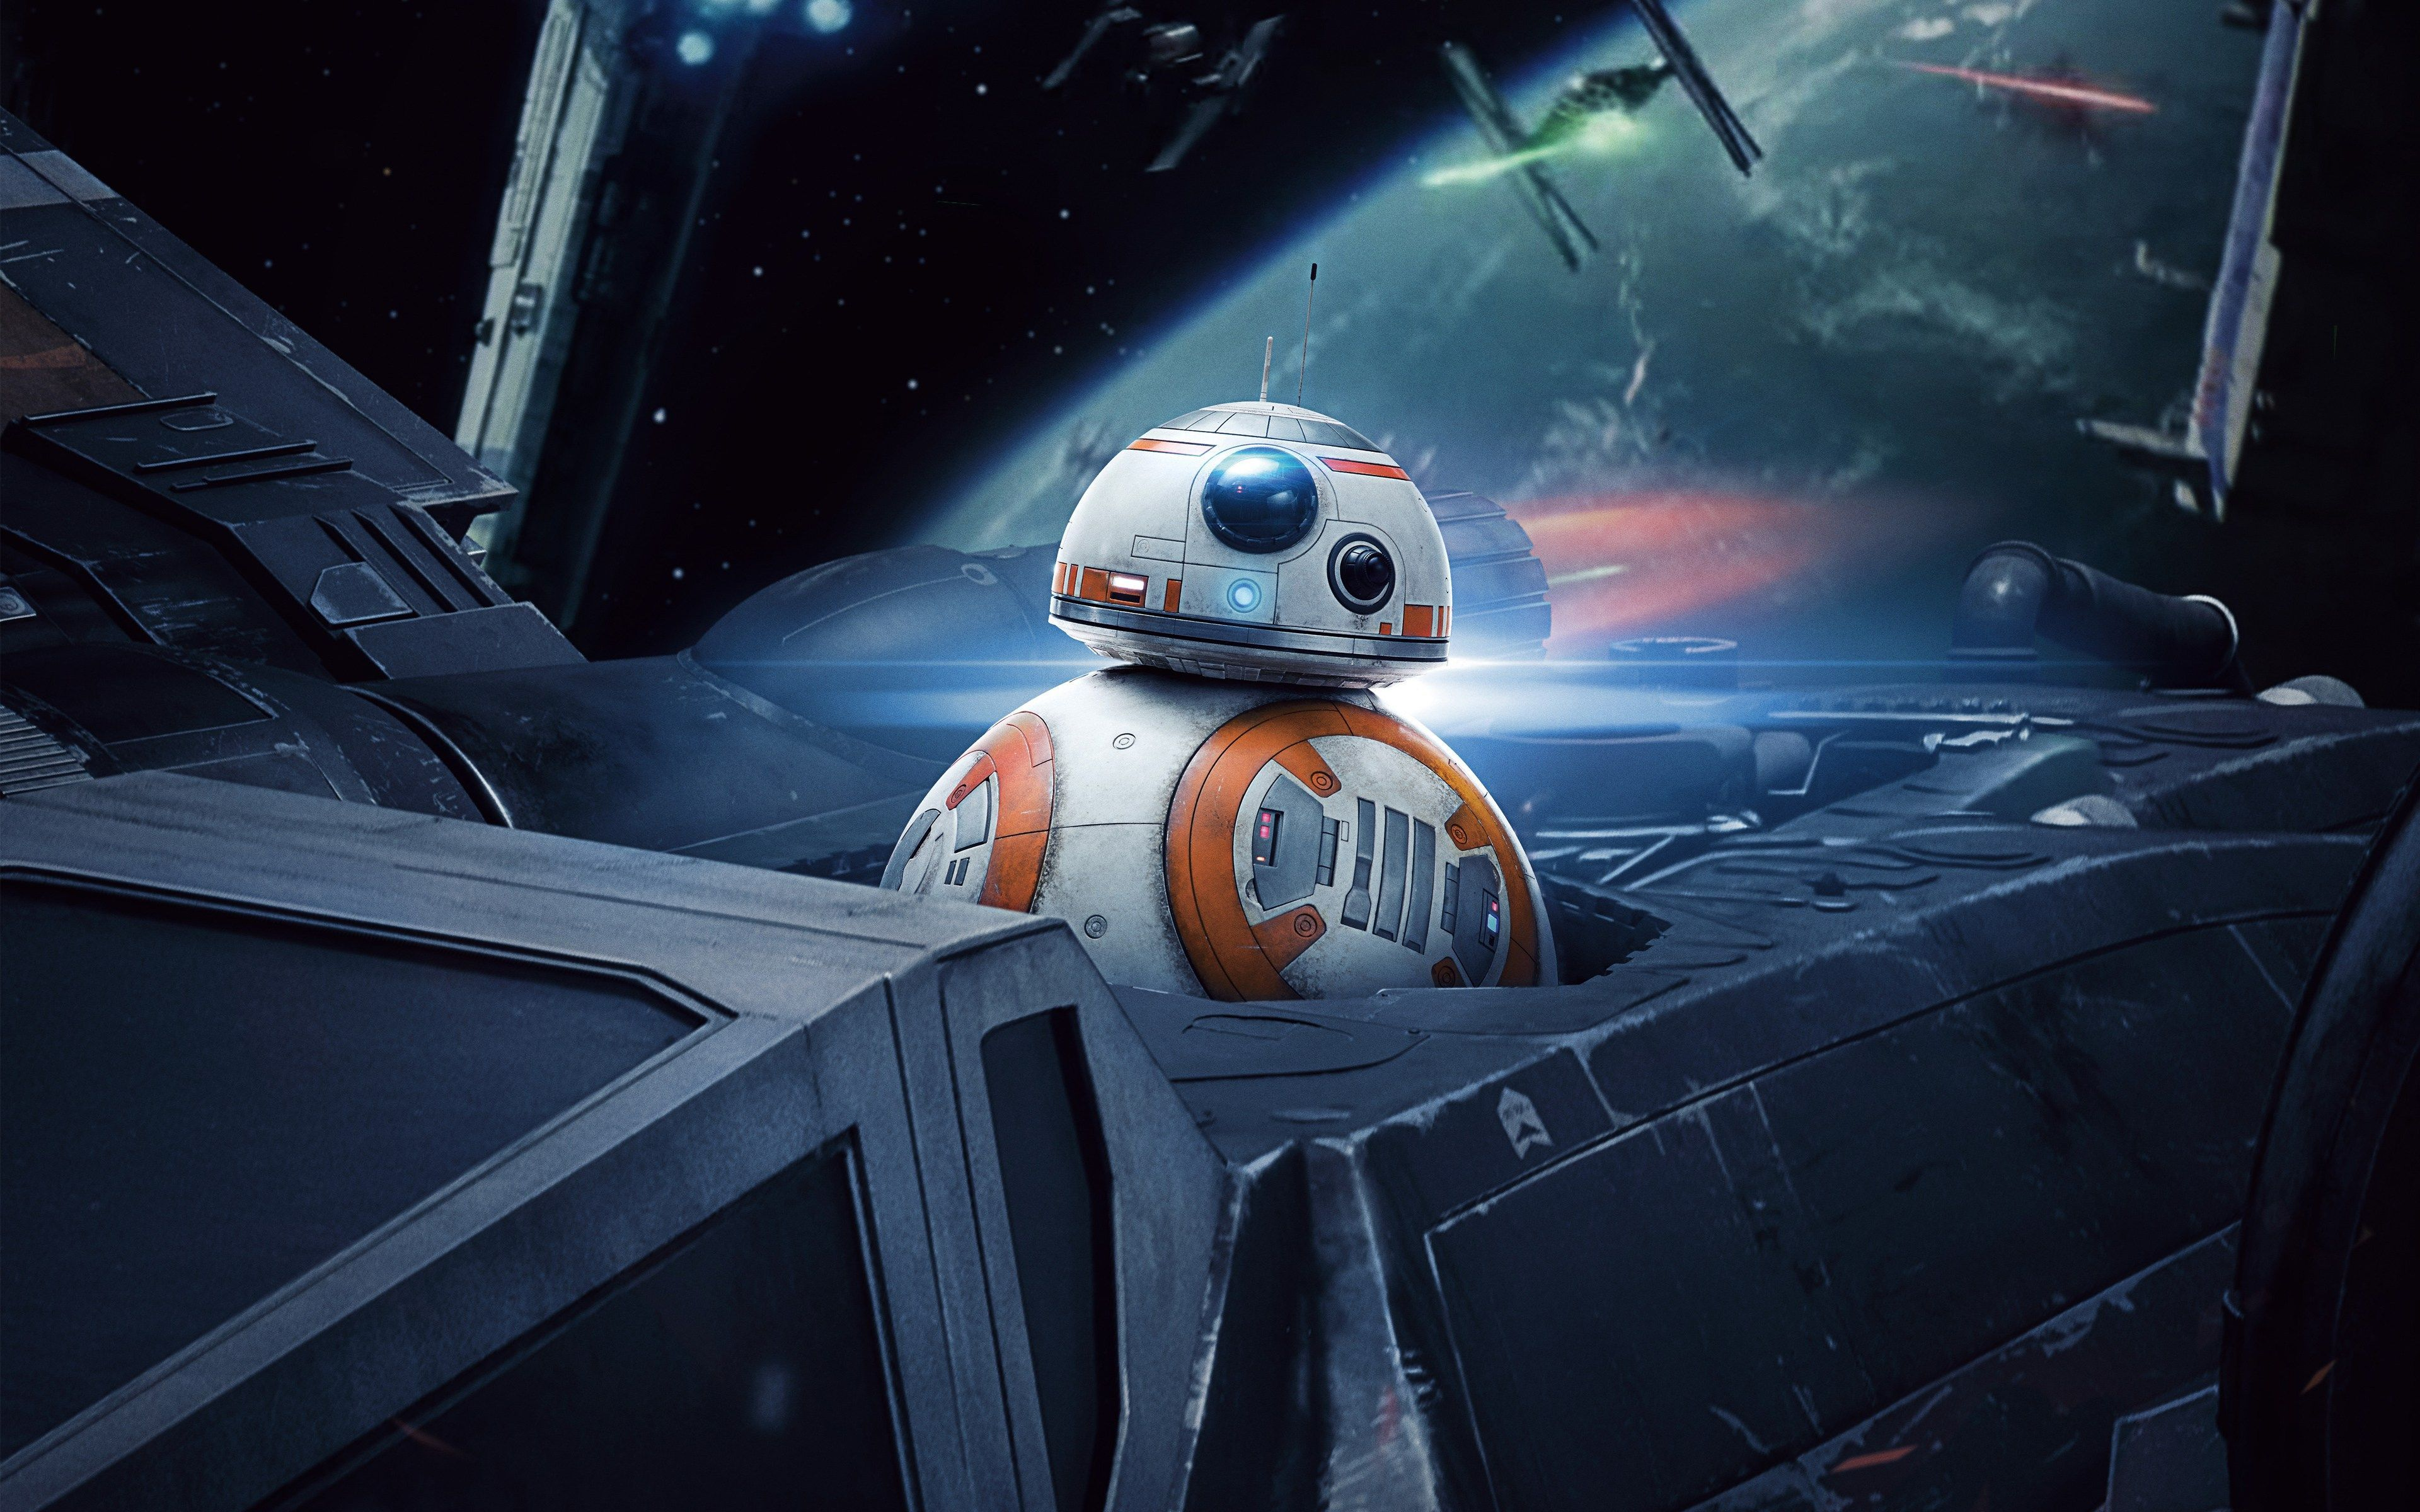 Star Wars 4k Hd Wallpapers Top Free Star Wars 4k Hd Backgrounds Wallpaperaccess